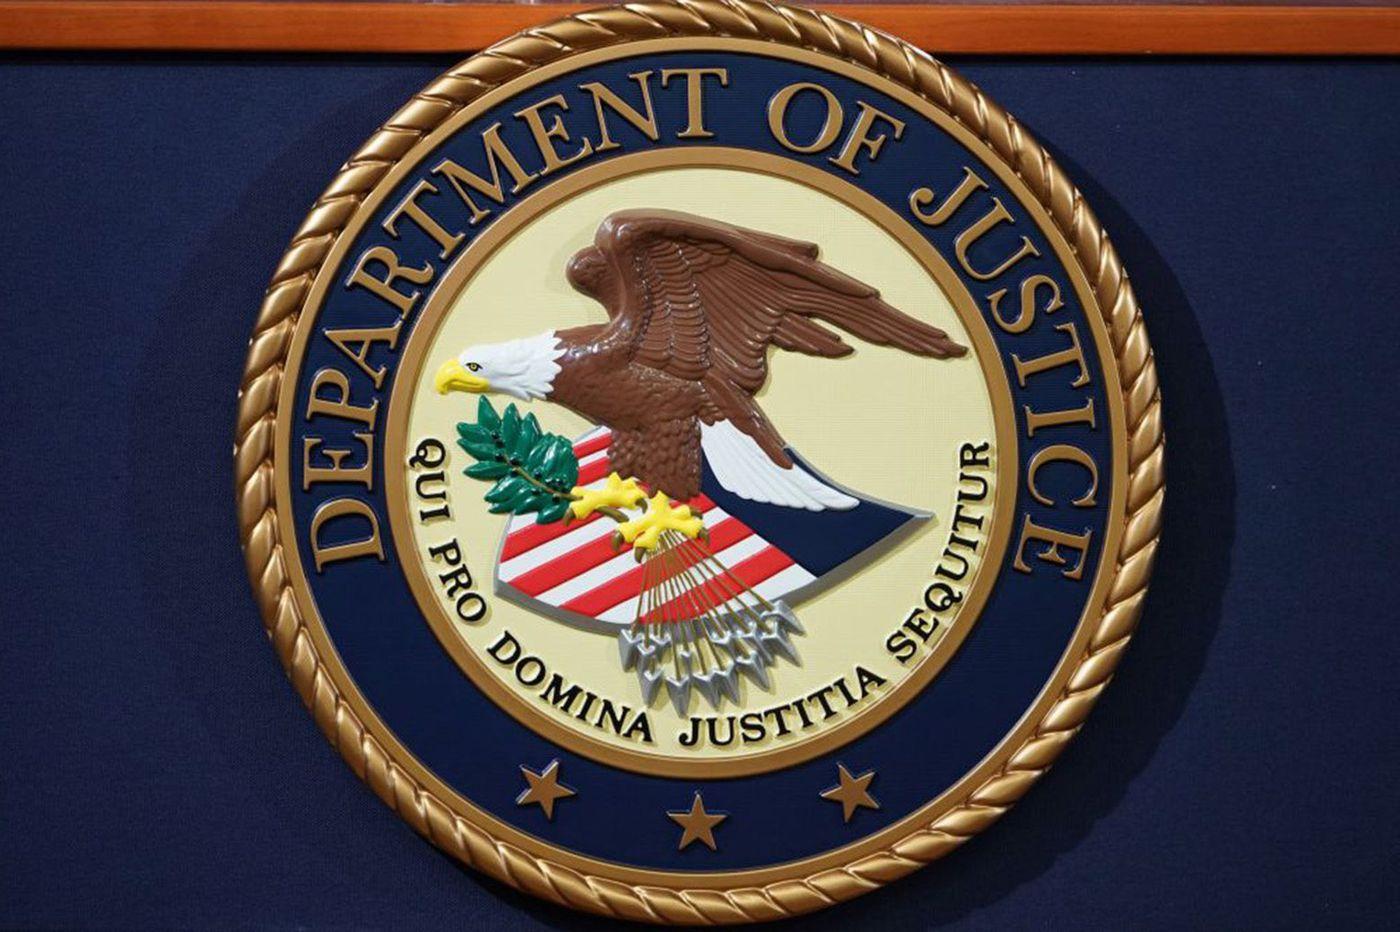 FBI, Philly prosecutors investigating N.J. corporate tax breaks, sources say